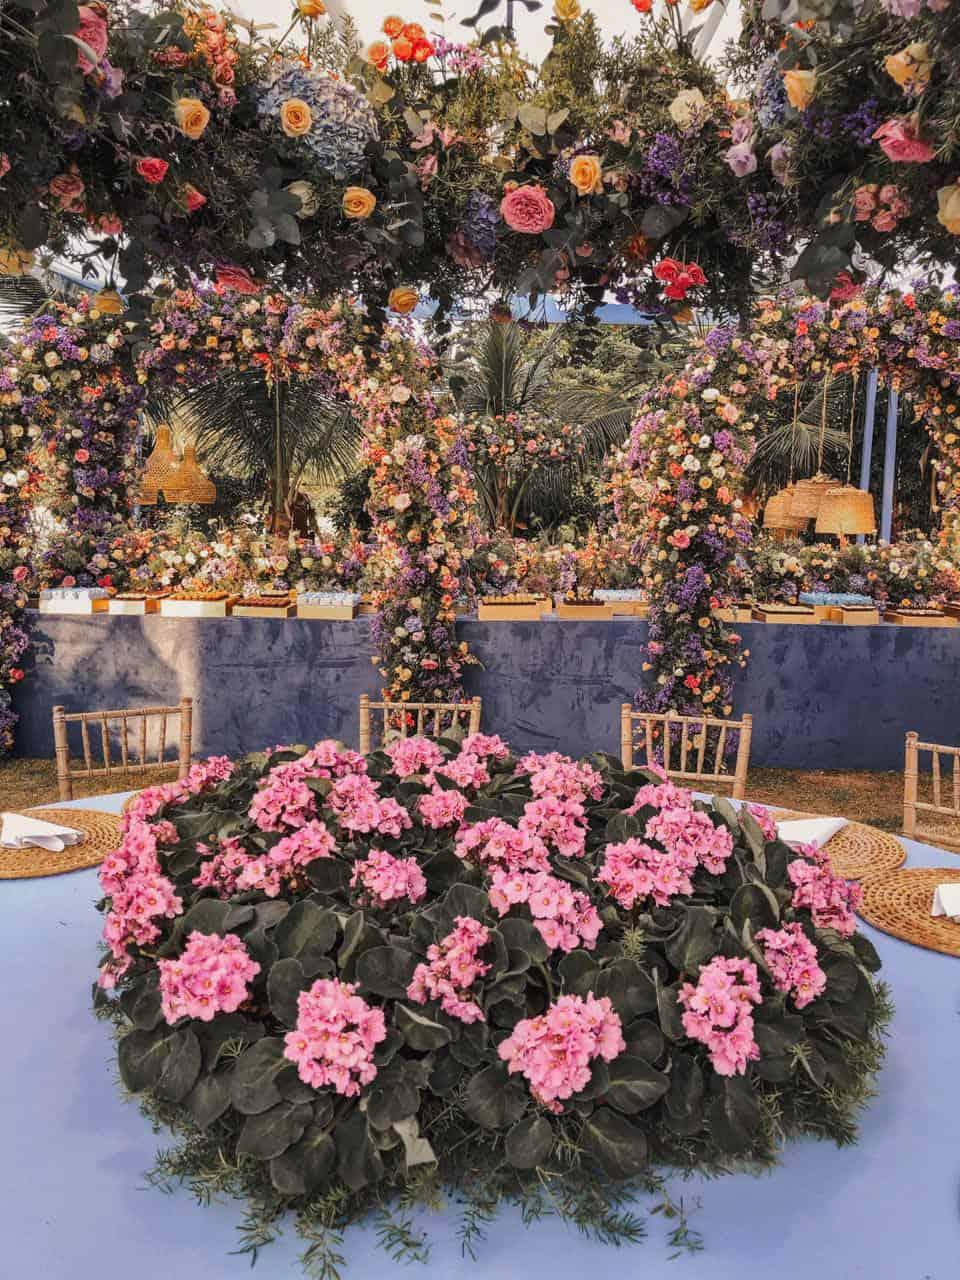 Casa-da-Maria-casamento-Mariana-e-Luan-Castelhanos-cerimonial-Vivianne-Melo-Espirito-Santo-Fotografia-Mariana-Andrich37